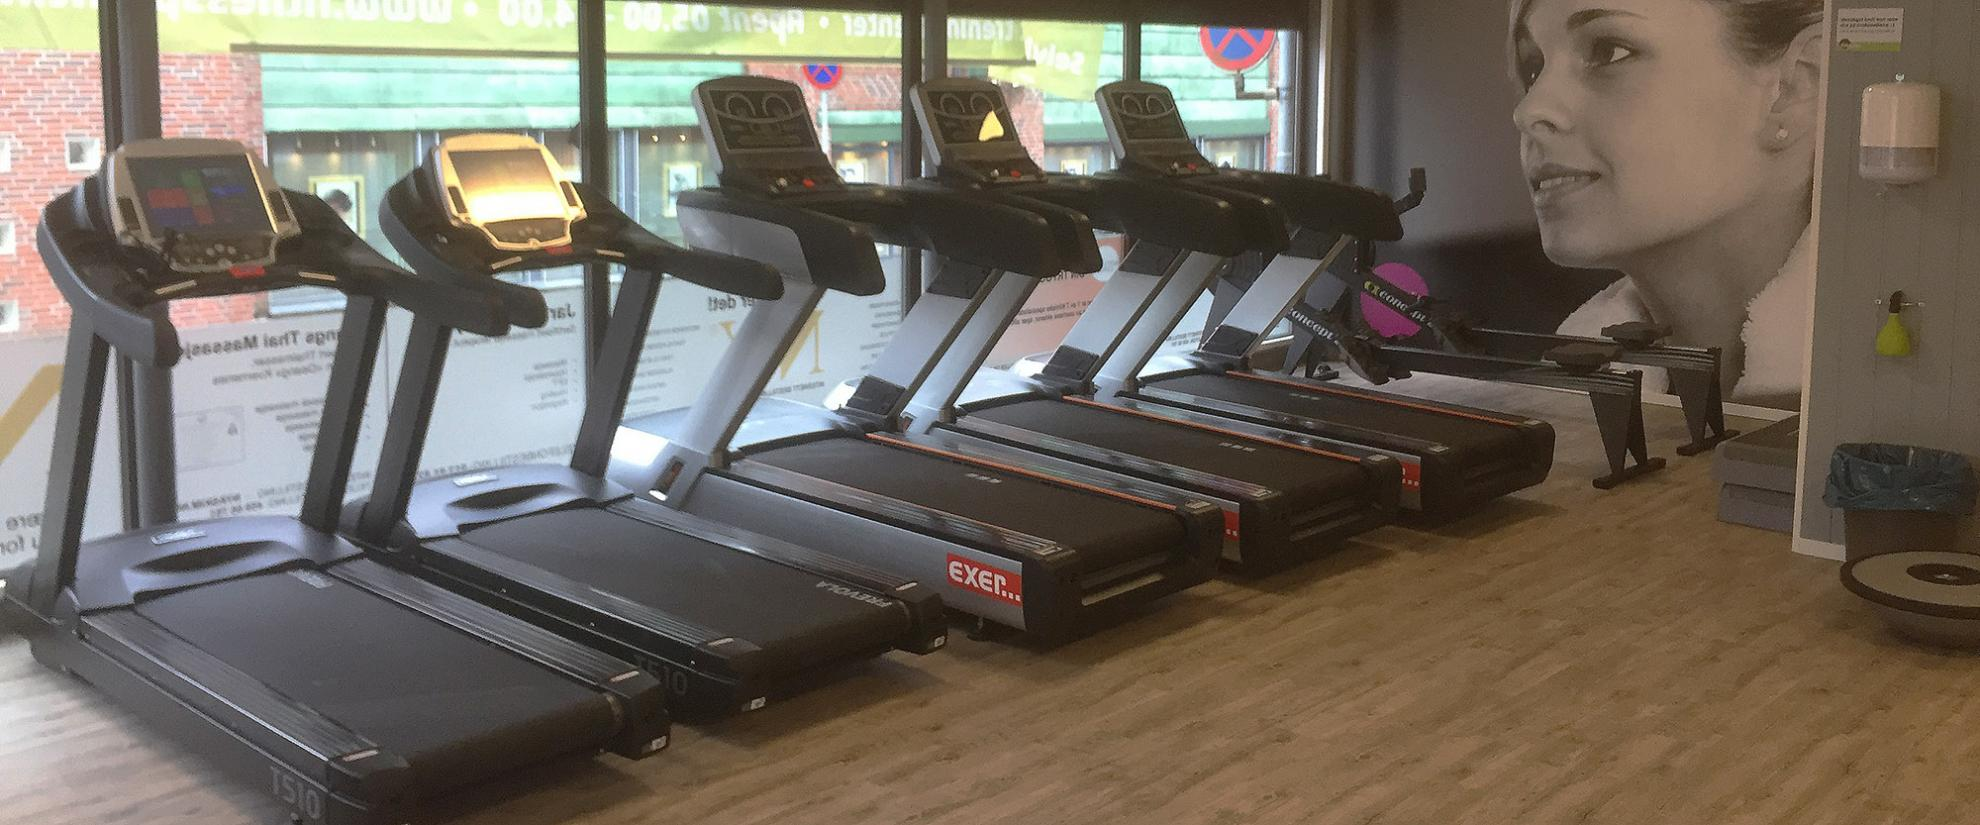 fitnesspoint-askim-header-image